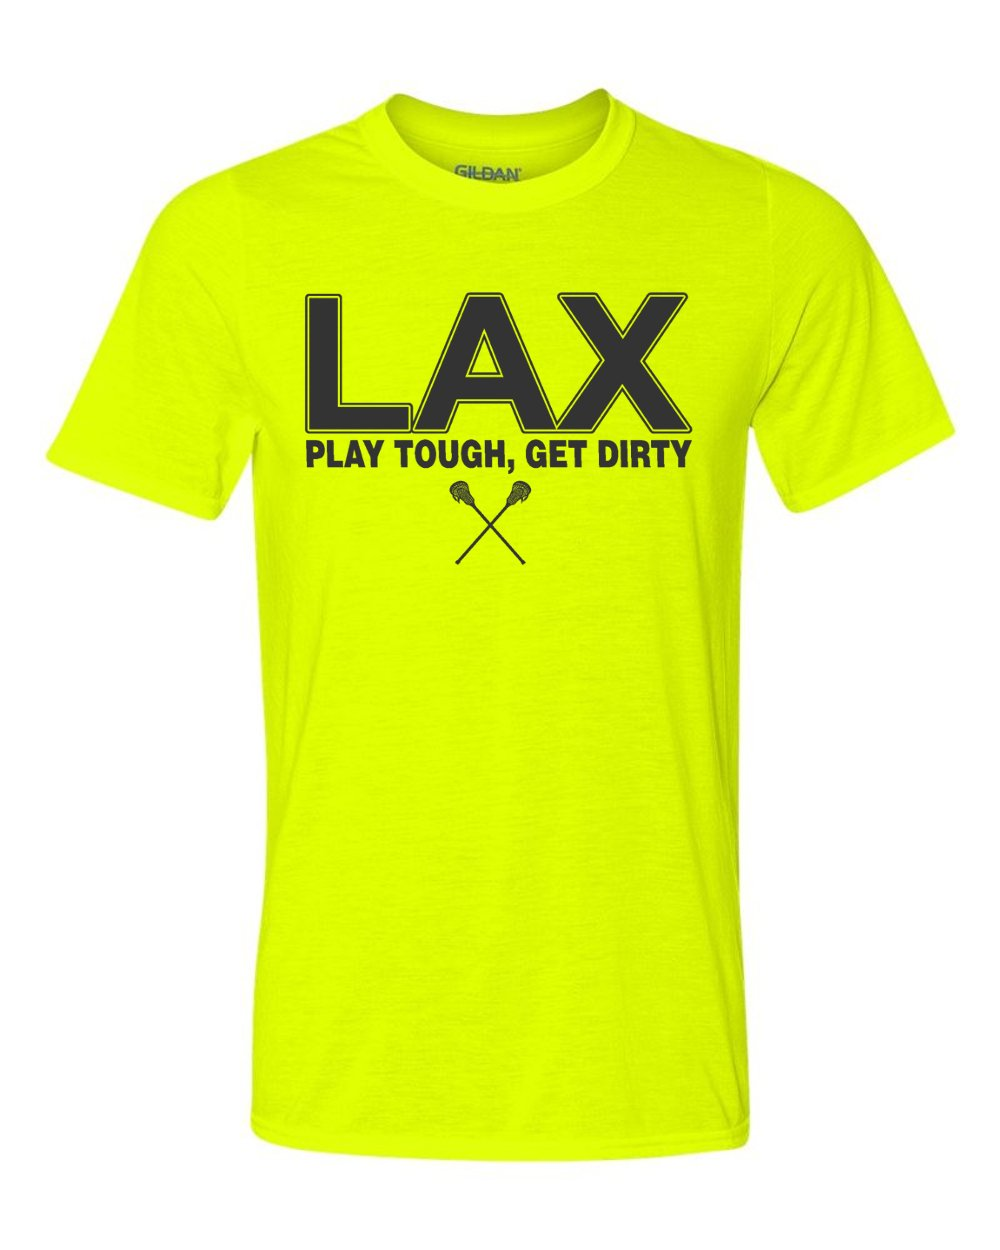 LAX Charcoal Logo JANT girl Lacrosse T-Shirt